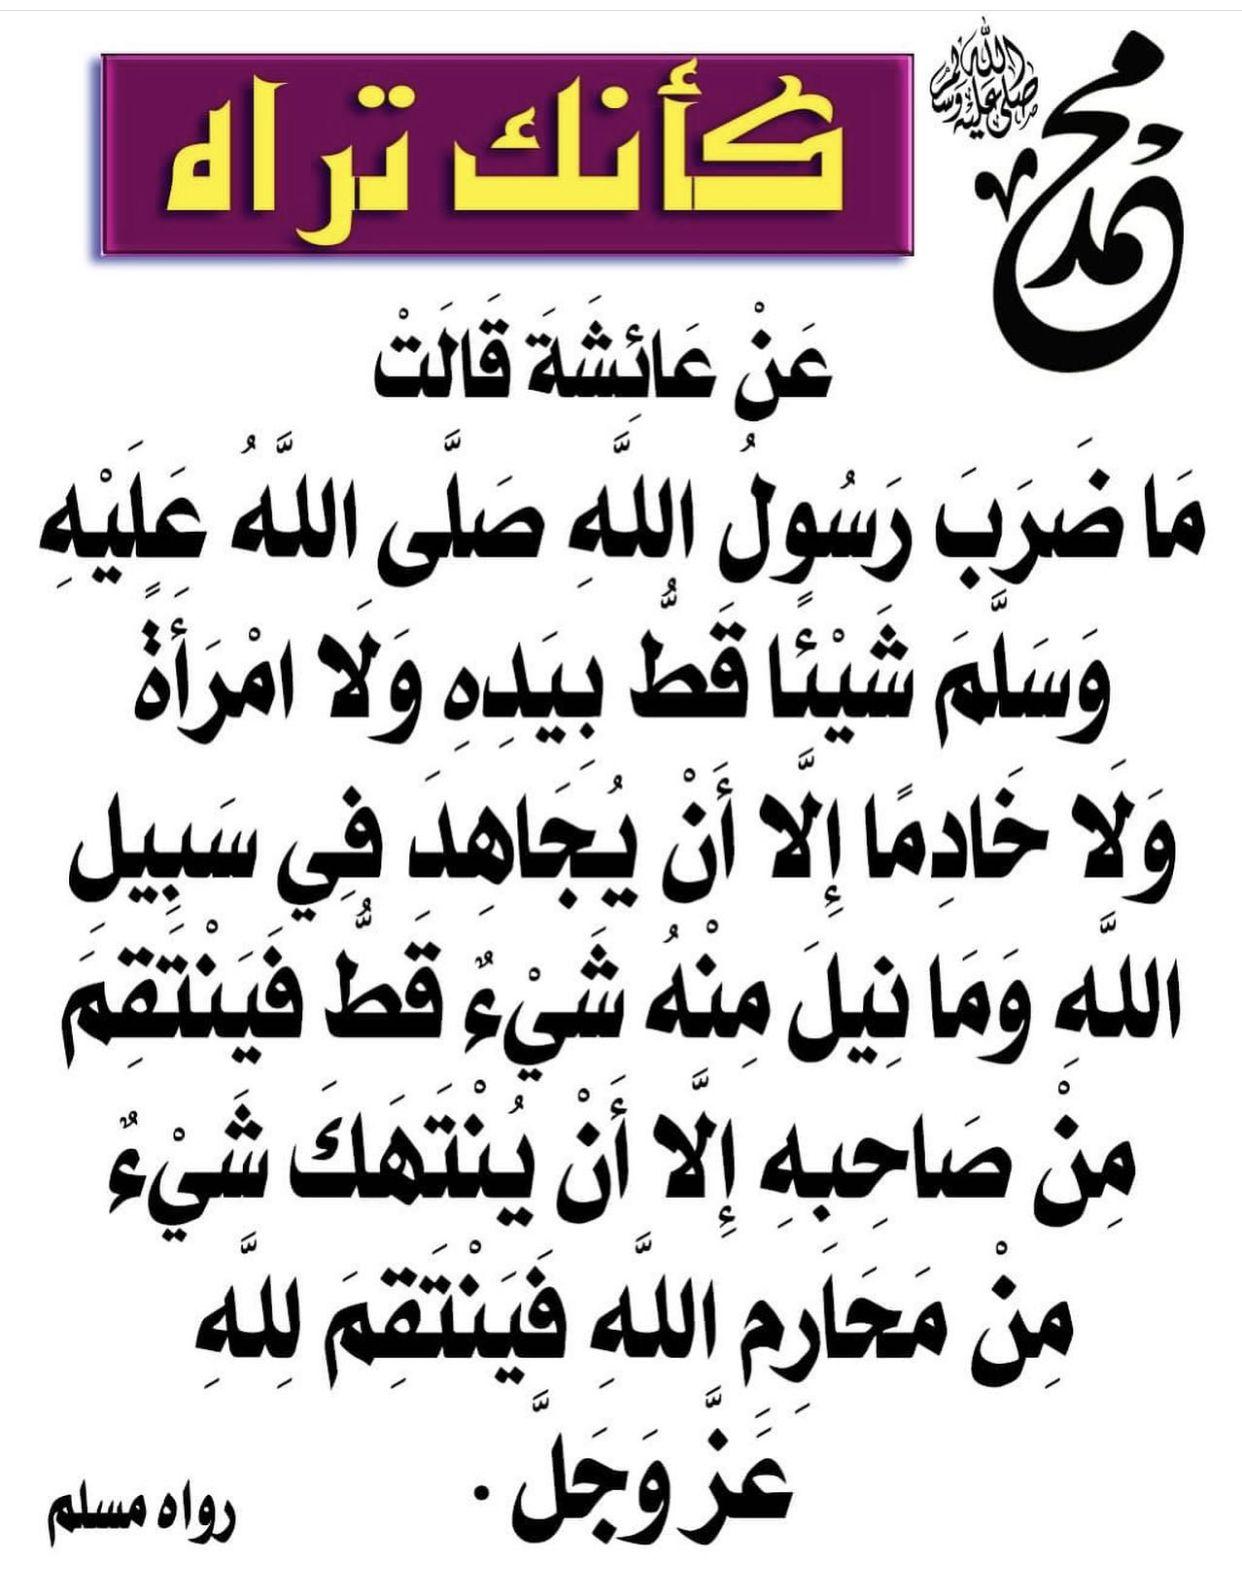 Pin By Madi On كأنك تراه صلى الله عليه وسلم Islamic Quotes Islam Facts Quotes